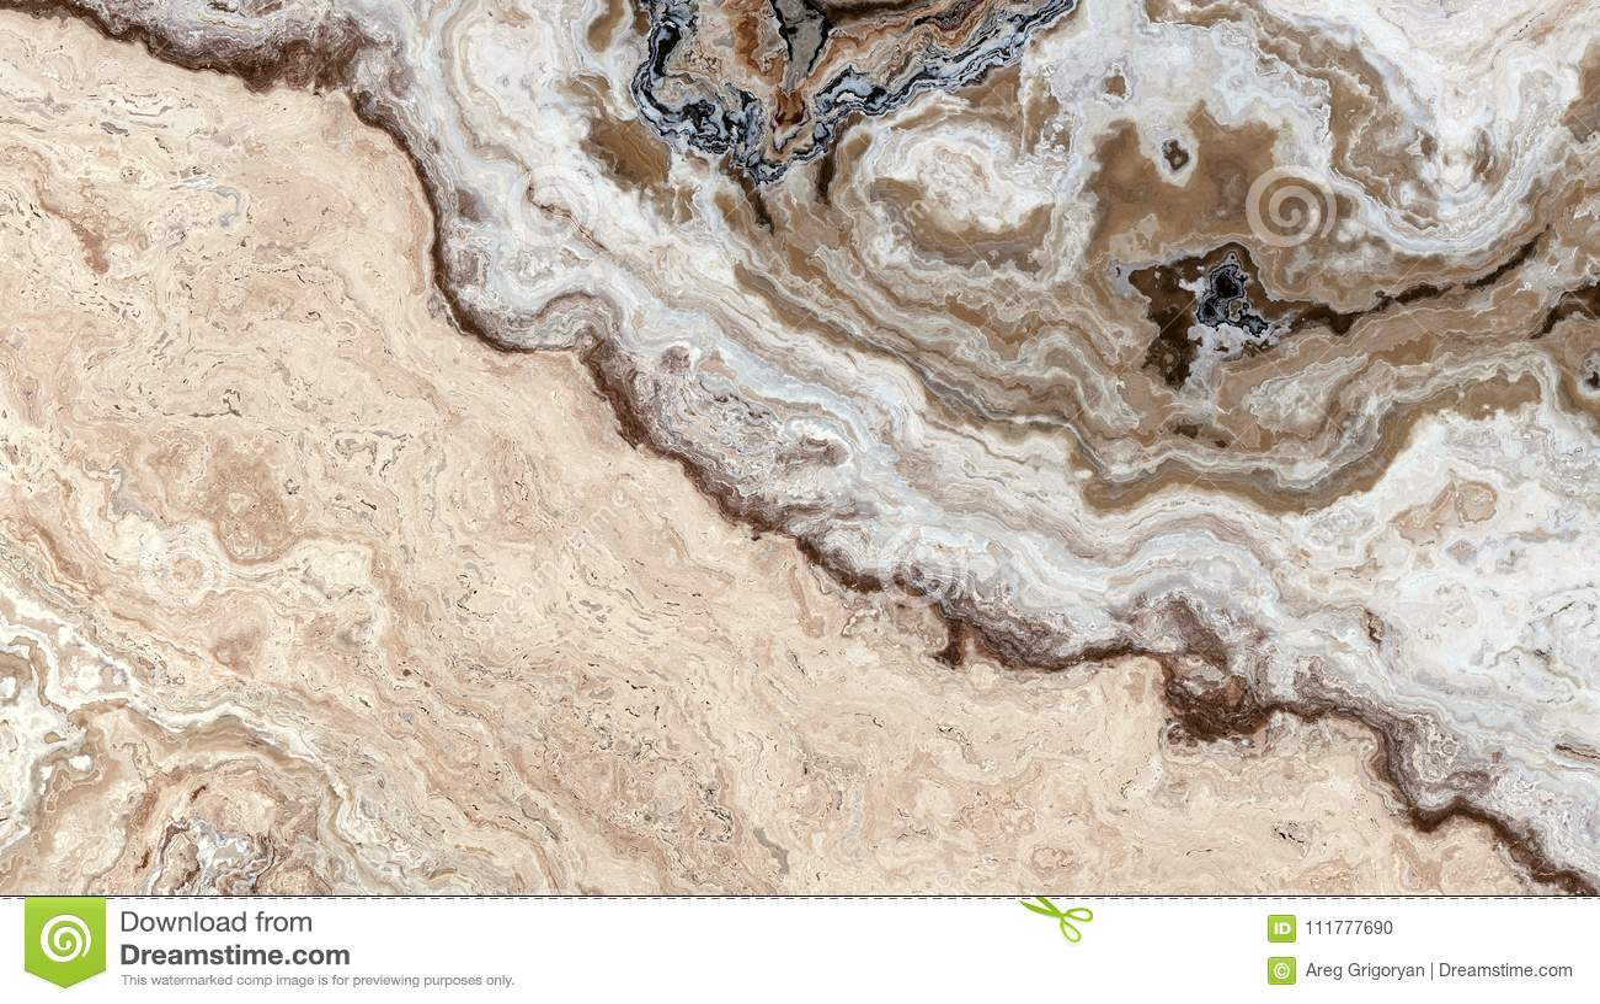 Onyx-travertine Tile texture